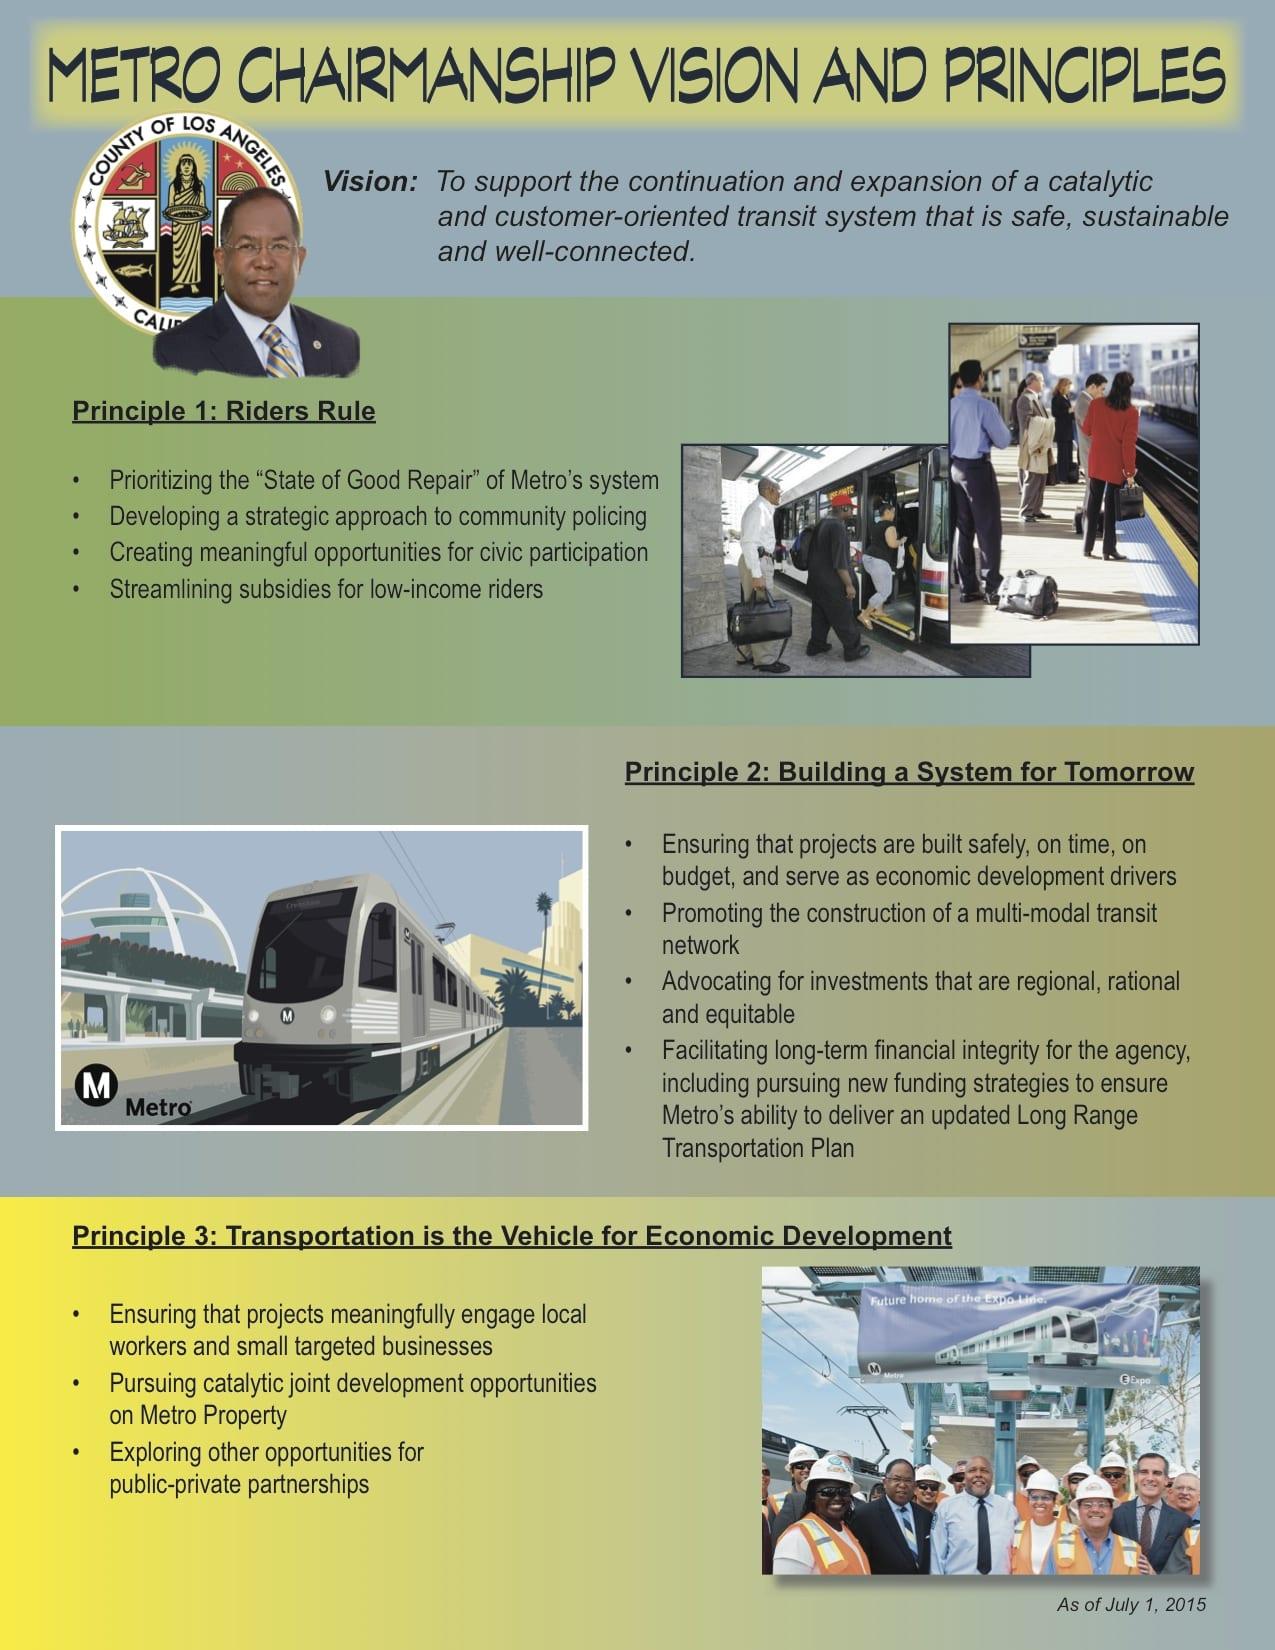 MRT principles